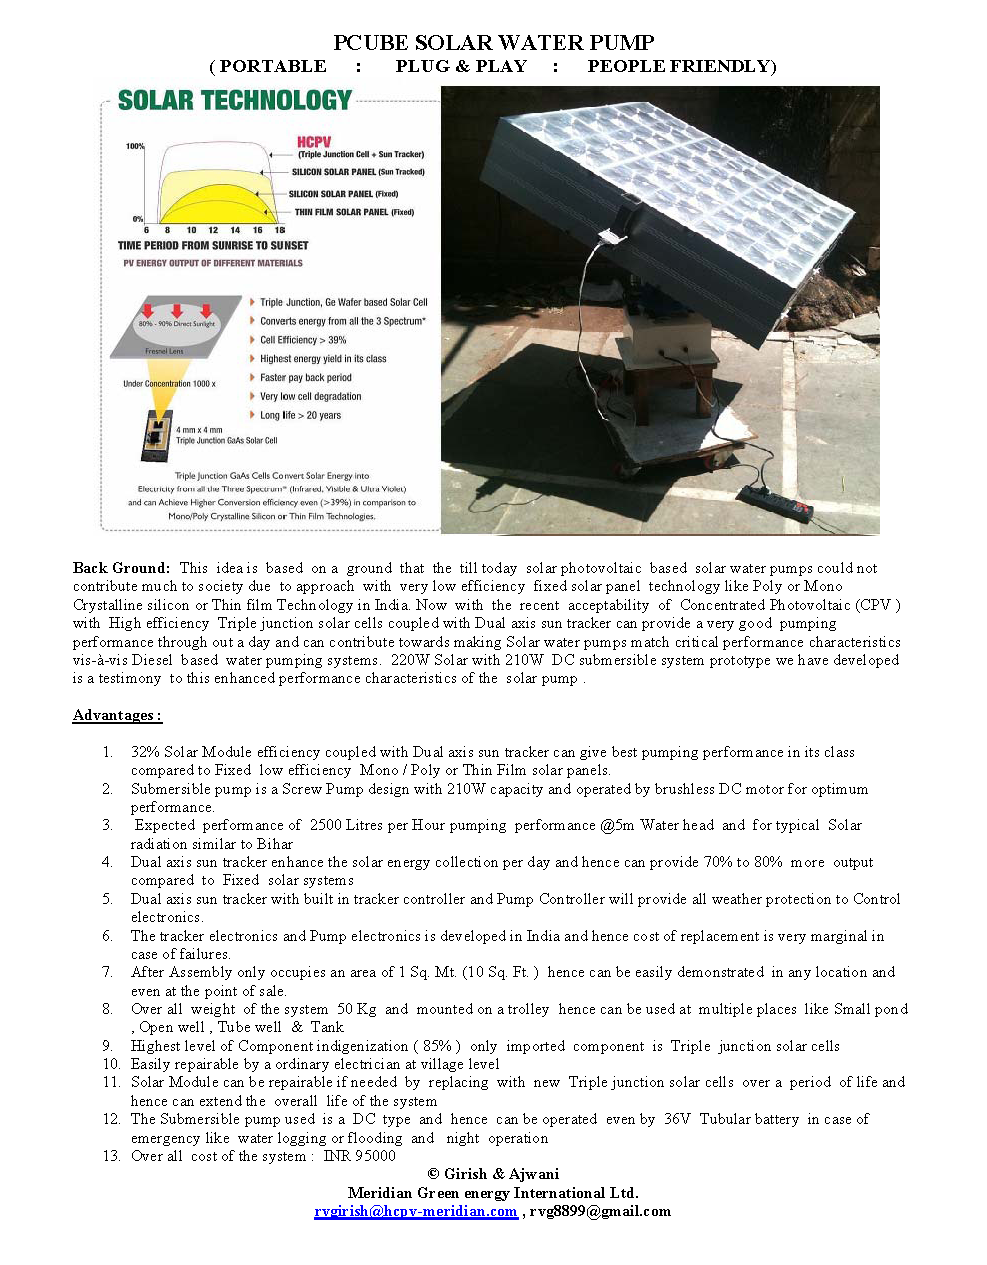 Pcube solar water pump bigger